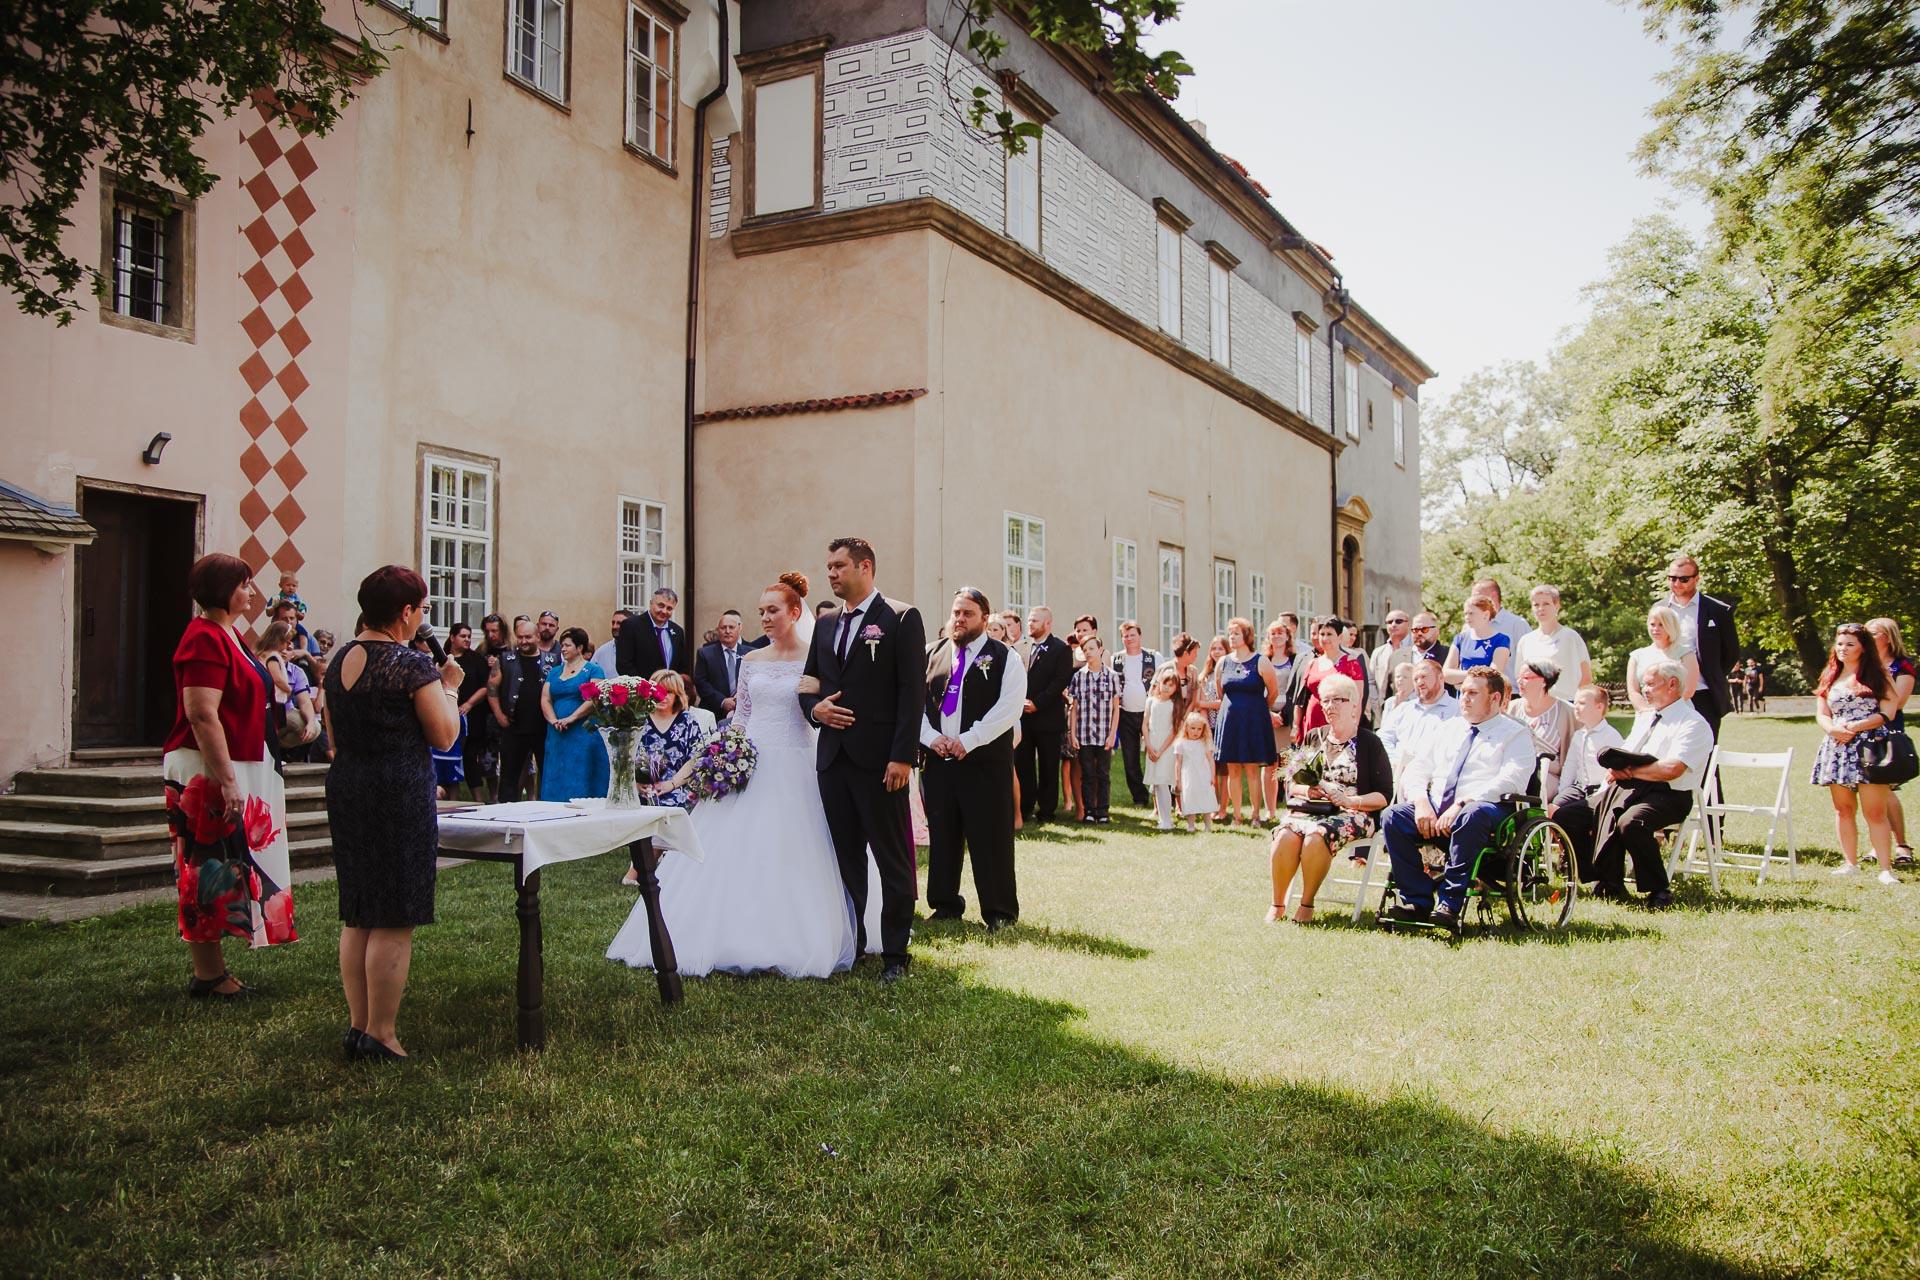 svatebni-fotografie-zamek-Brandys-nad-Labem-1177